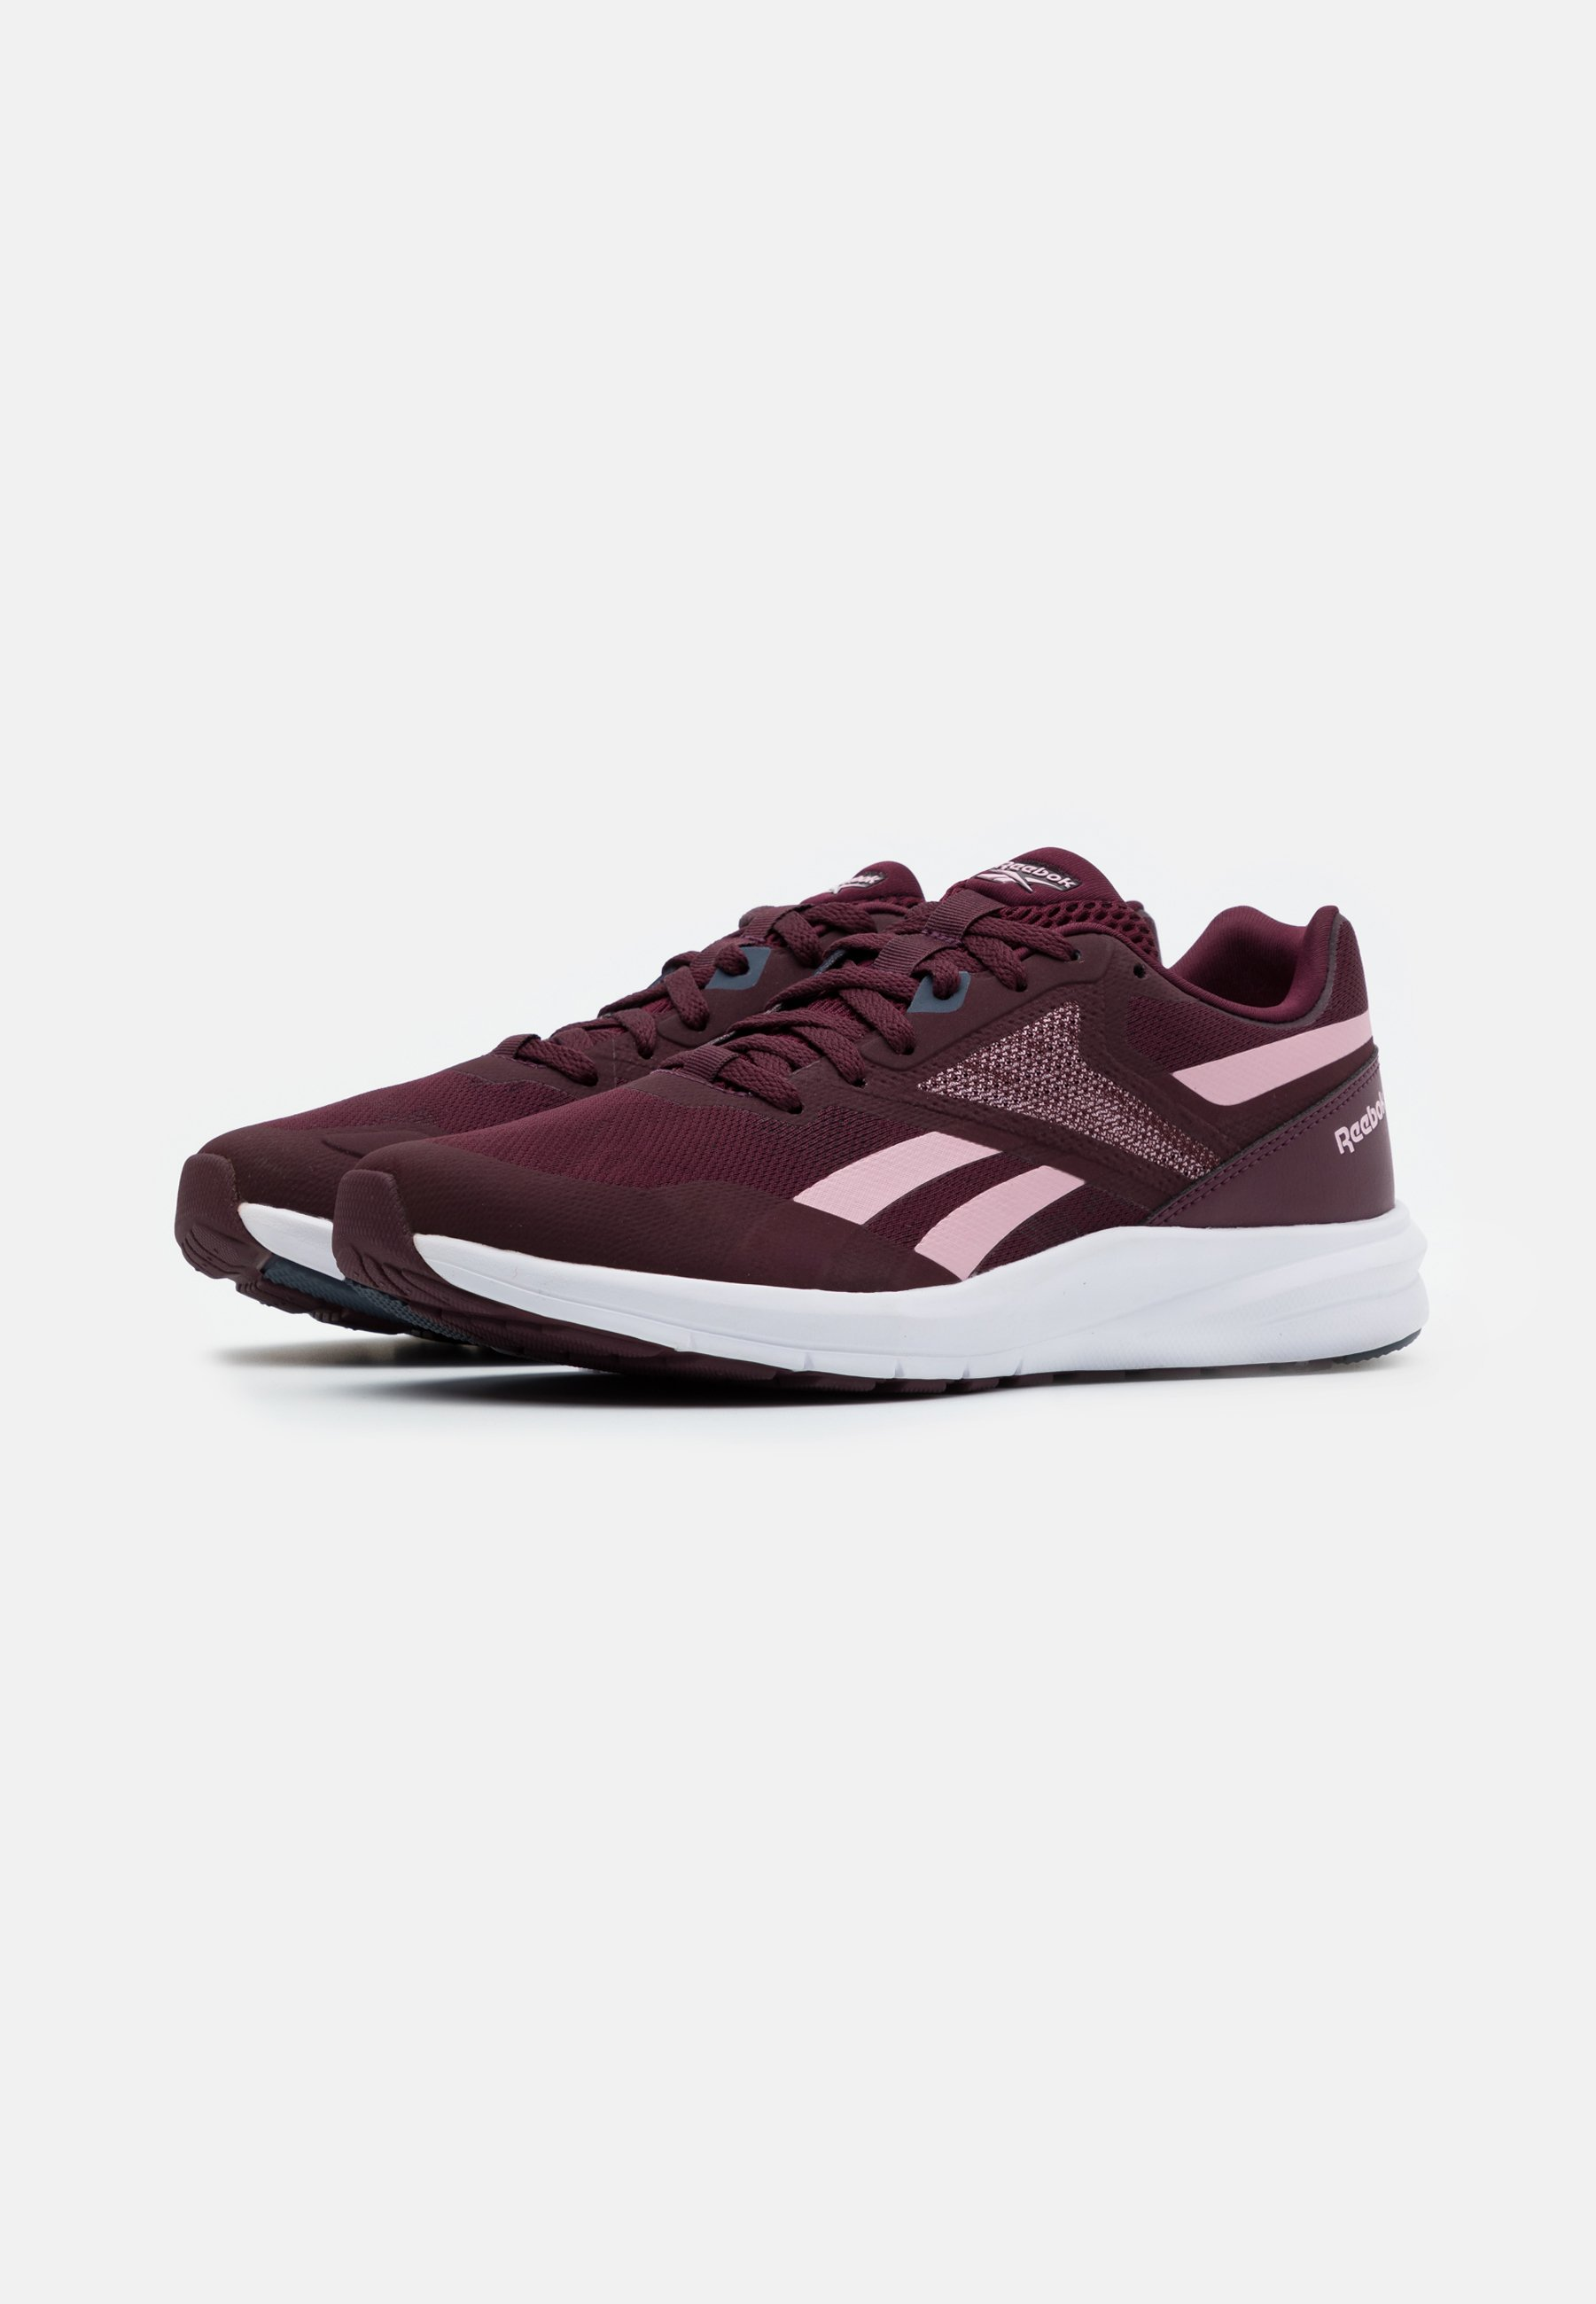 RUNNER 4.0 Chaussures de running neutres maroonclassic pinksmoke indigo